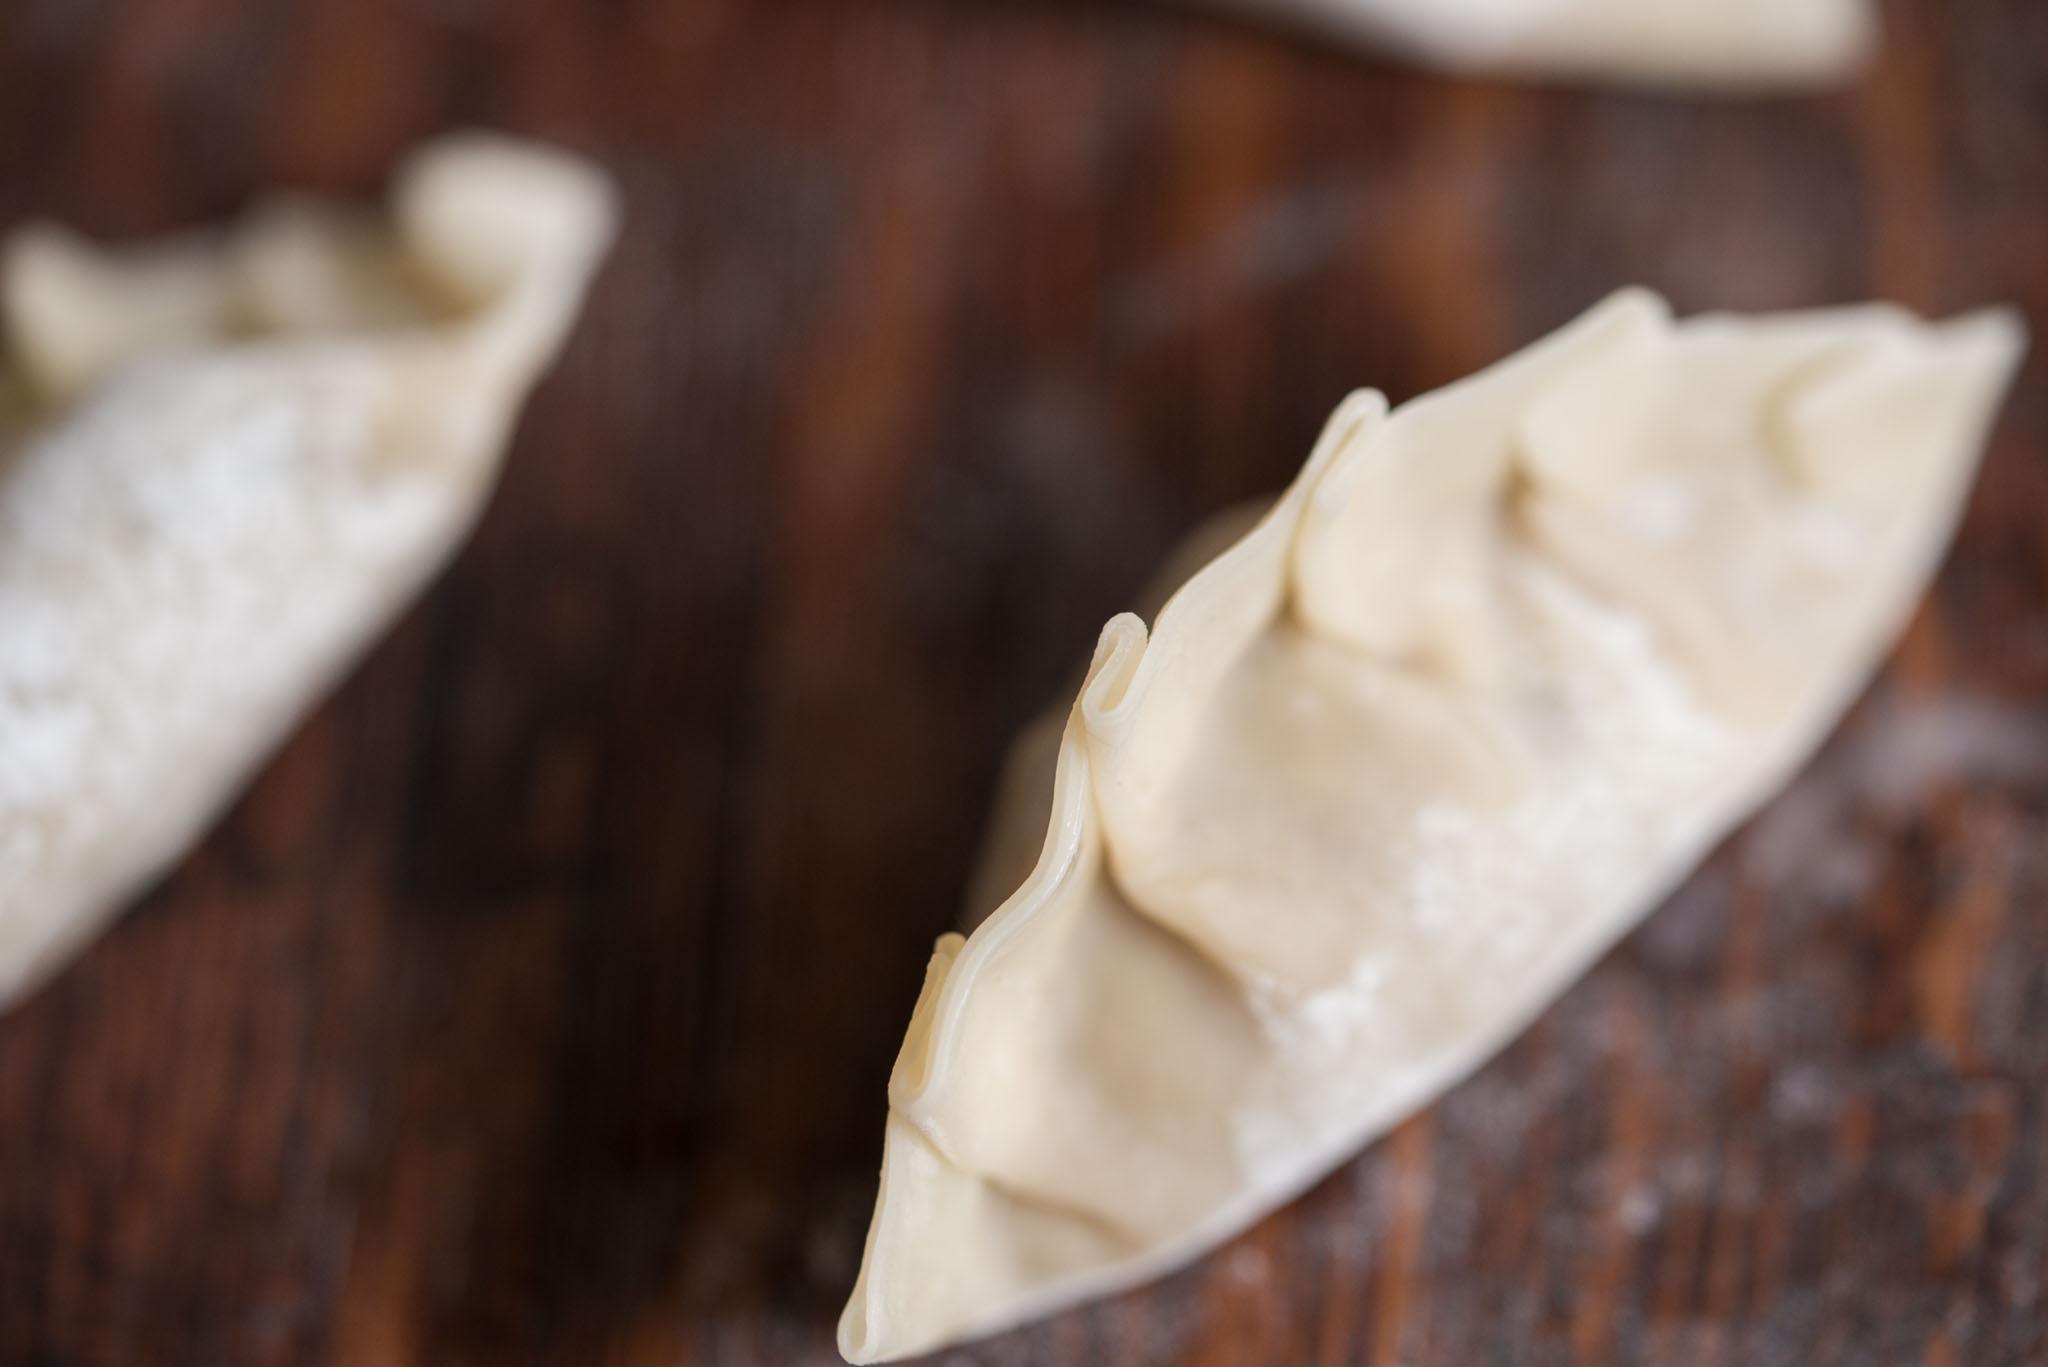 Mixed & Measured | Sweet Potato Shiitake Potstickers